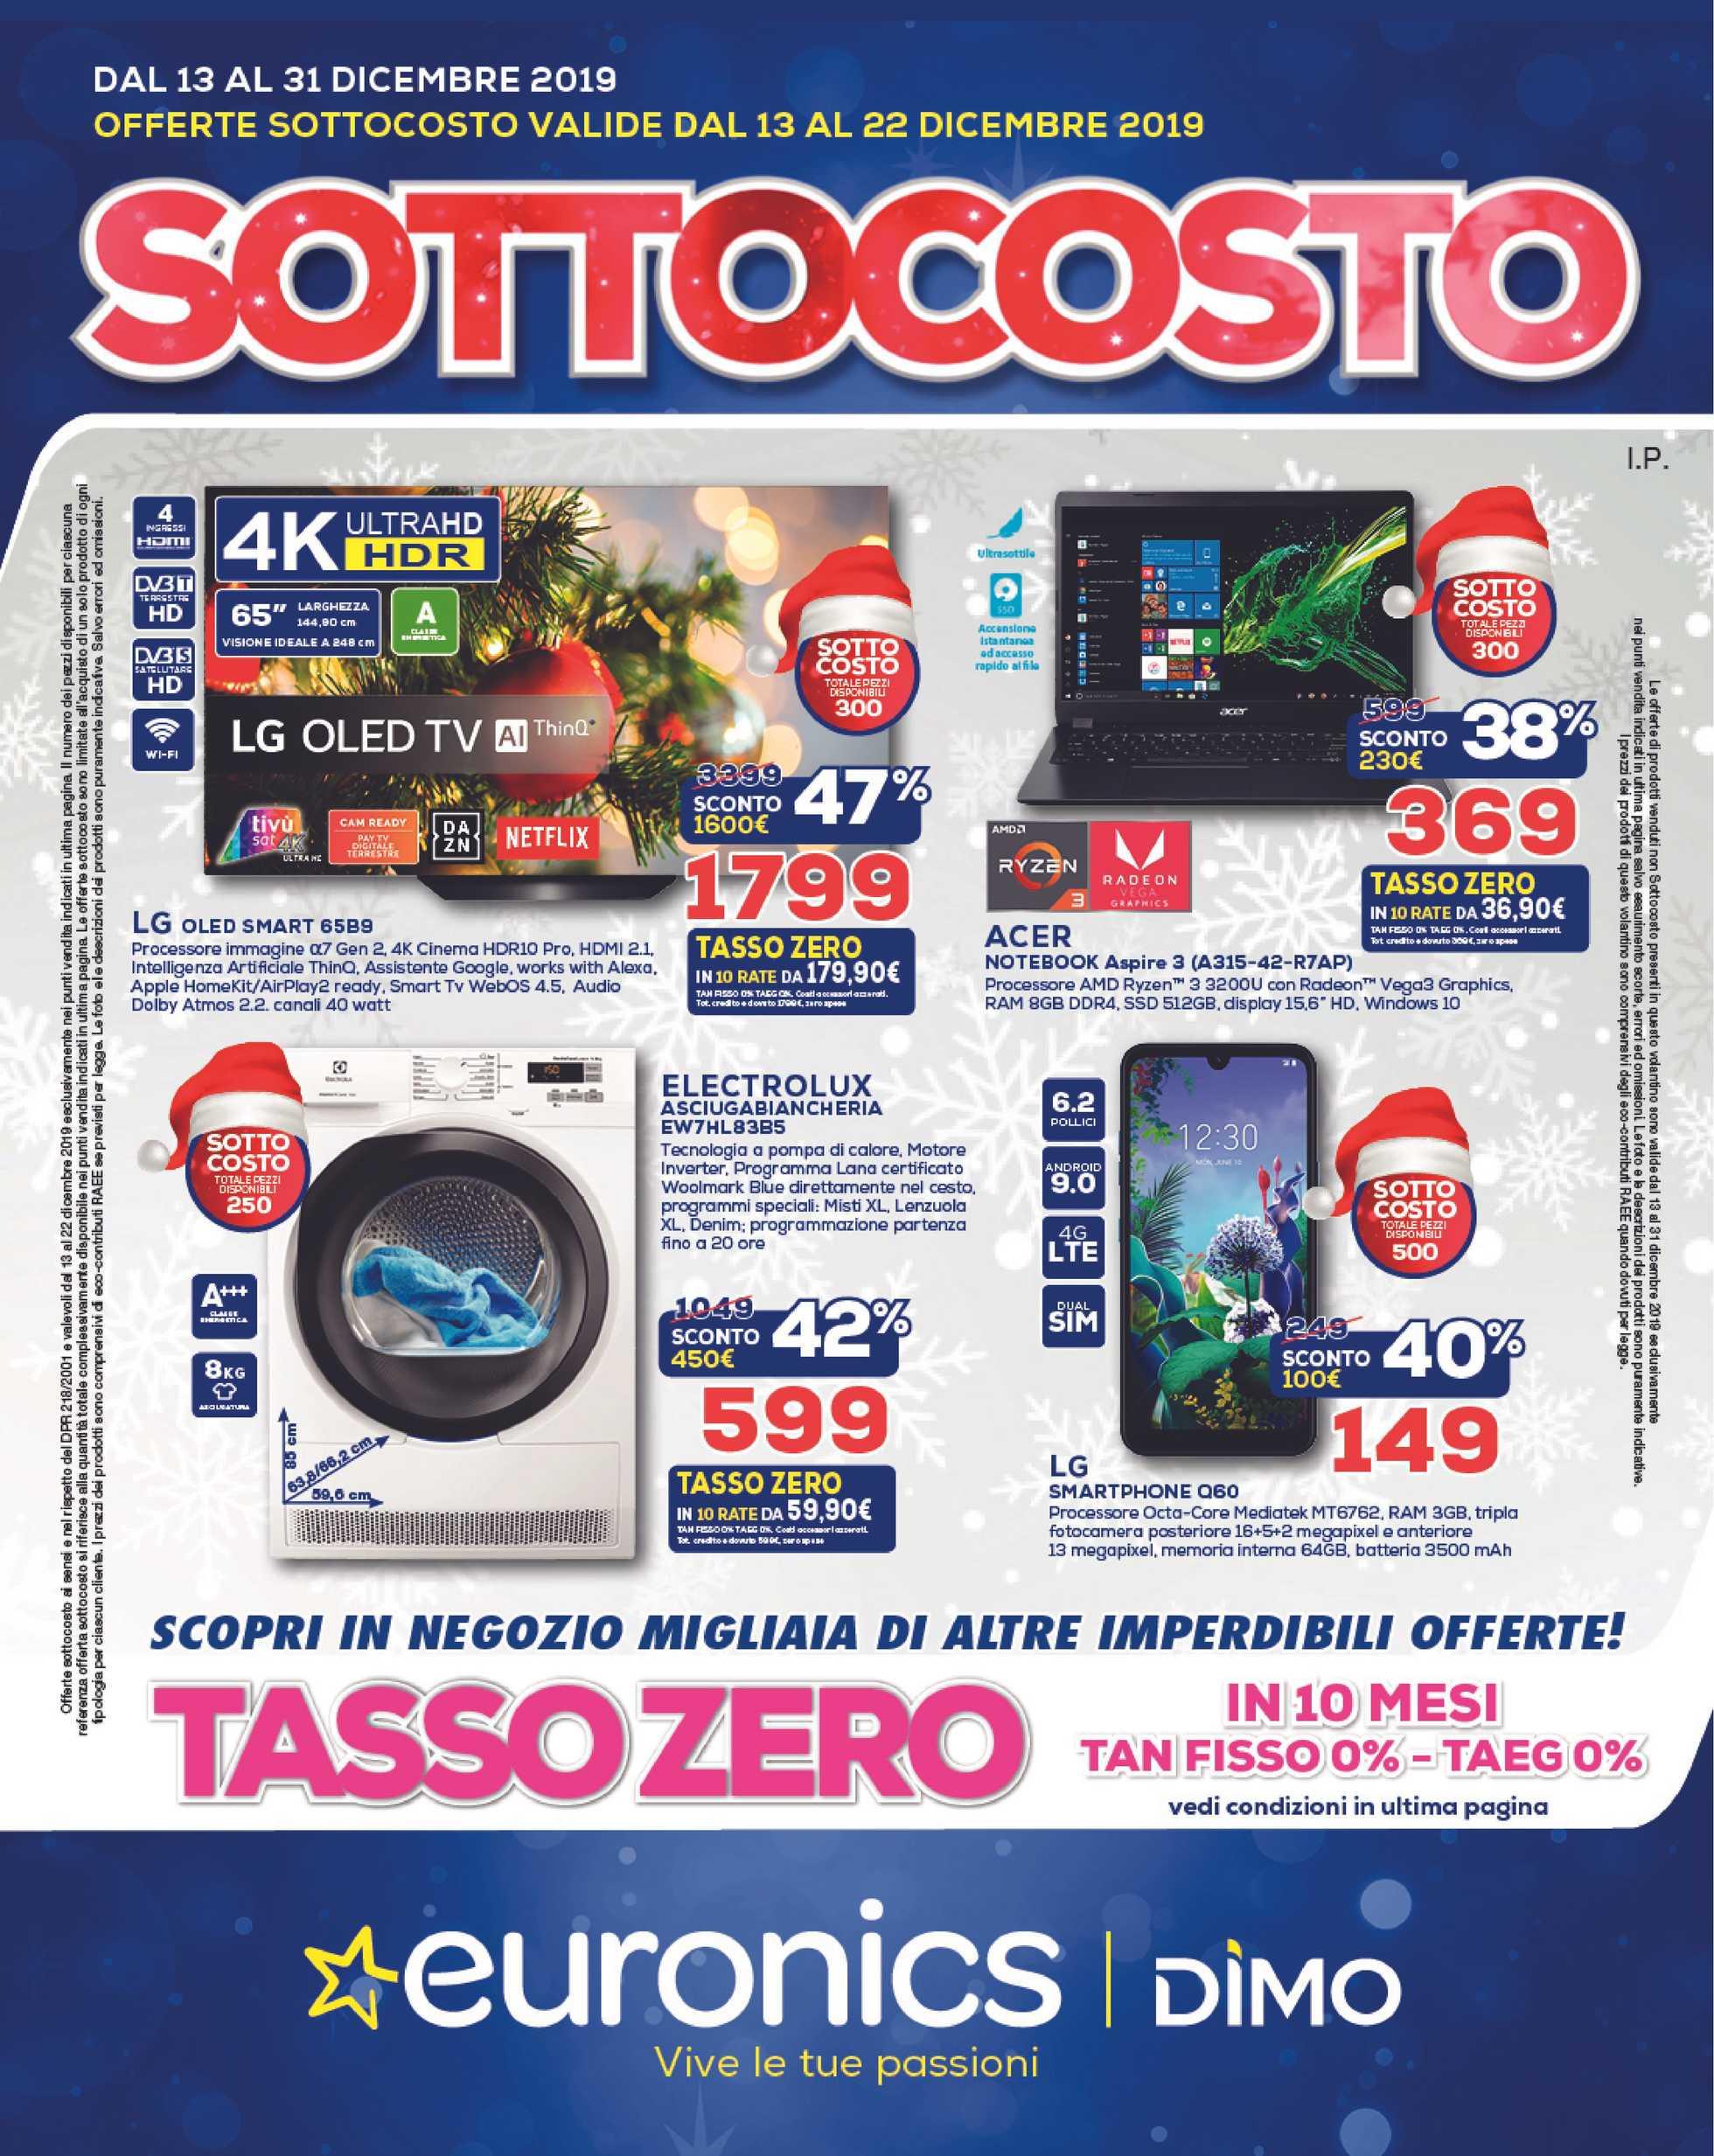 Euronics Bruno - offerte valide dal 12.12.2019 al 31.12.2019 - pagina 1.